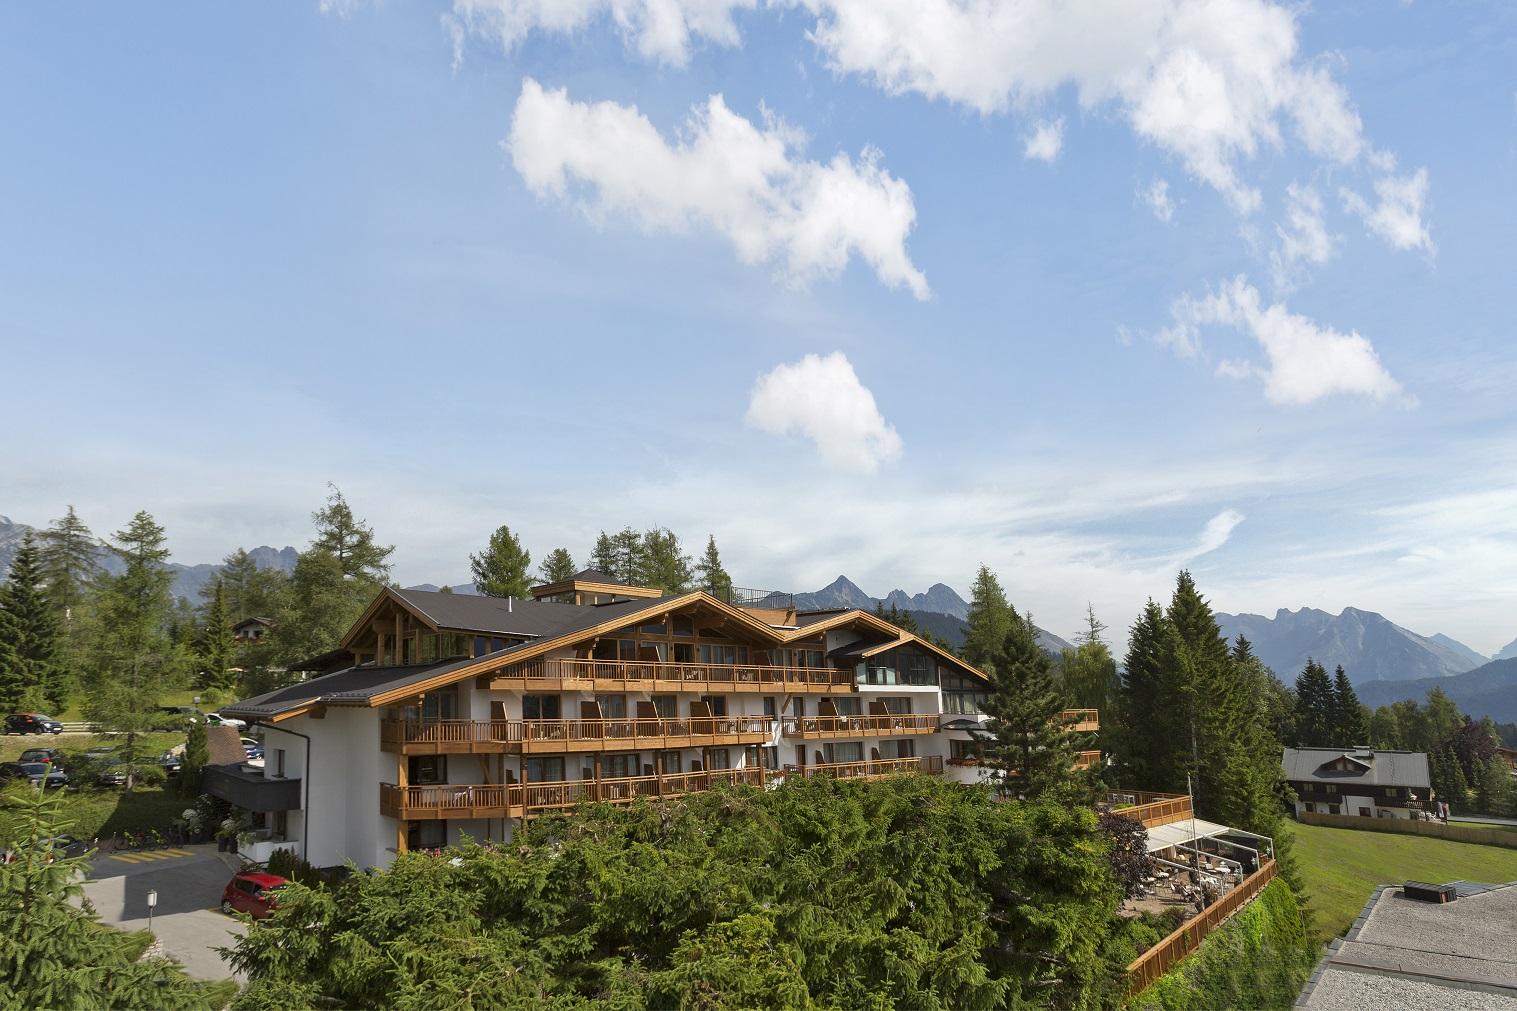 SPA: Foto vom Wellnesshotel Natur & Spa Hotel Lärchenhof   Wellness Tirol